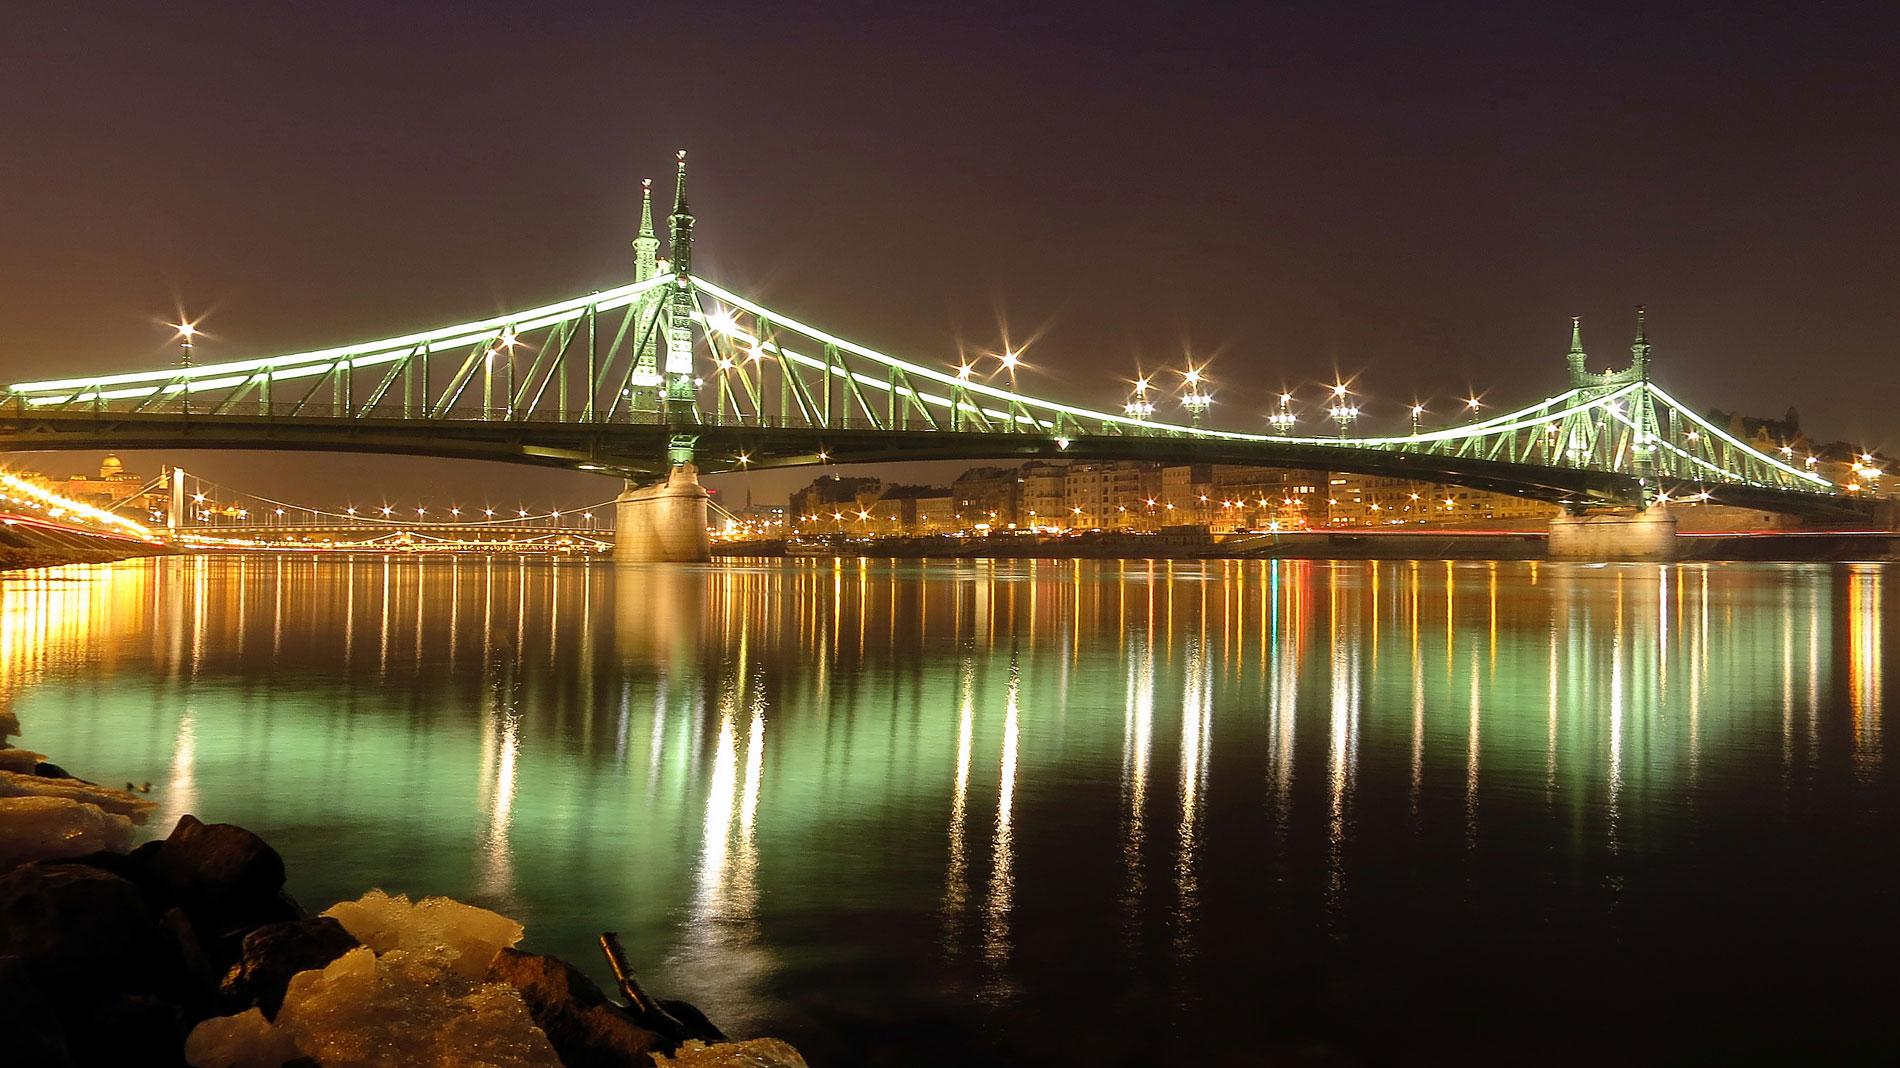 budapest_atthary_photography_bridge_37